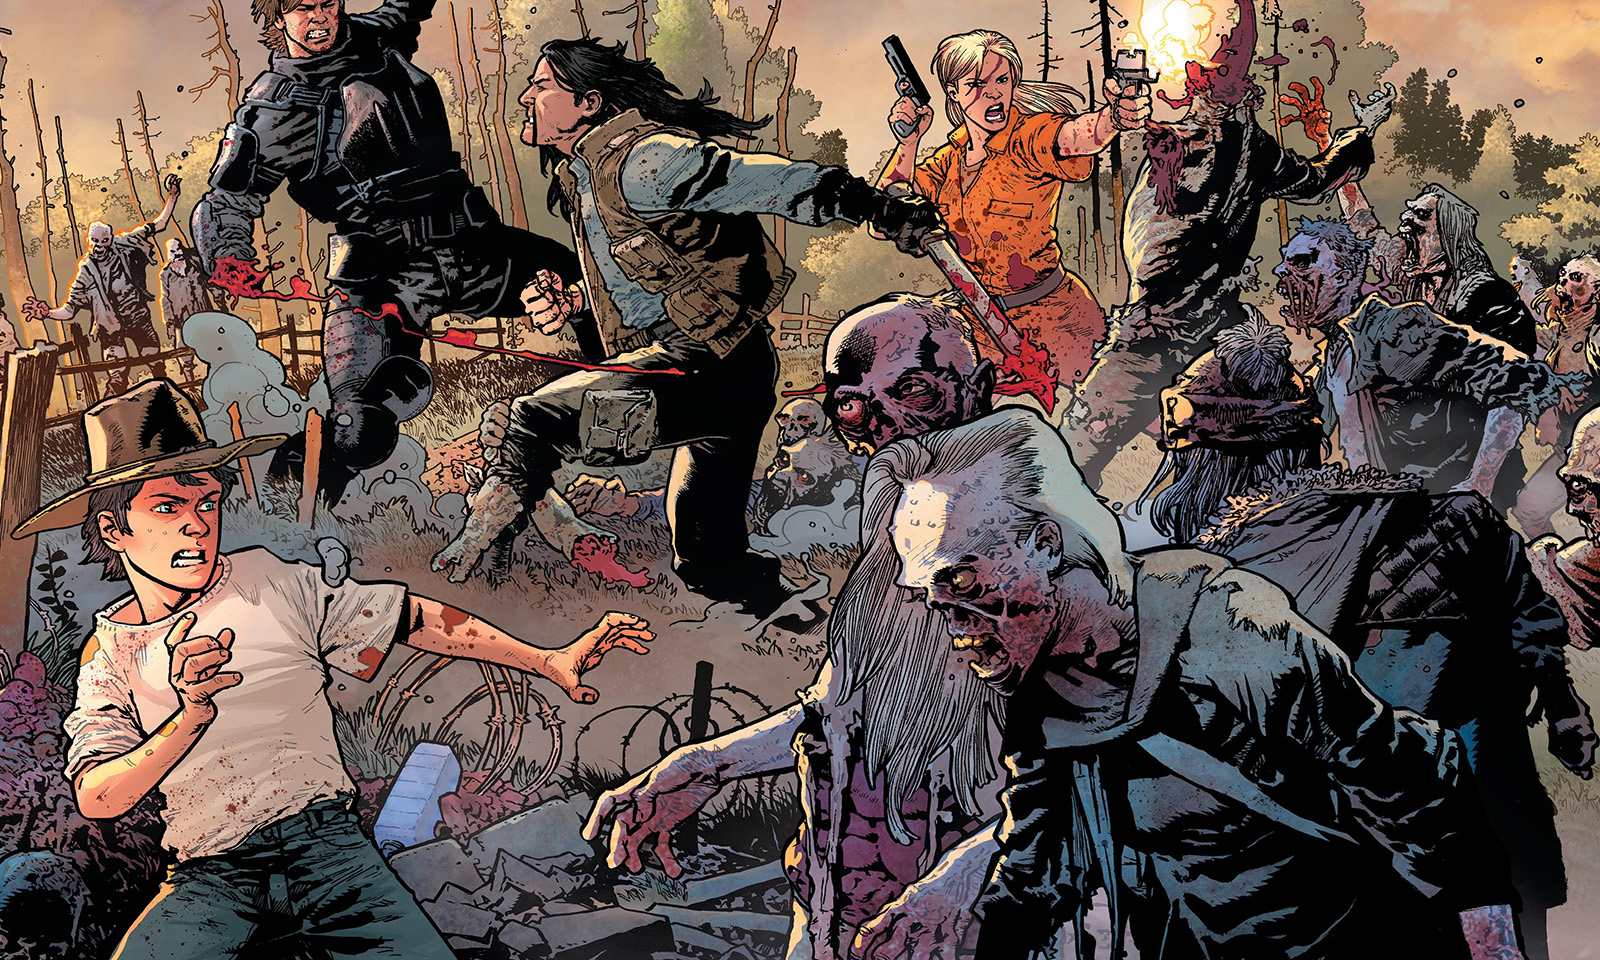 Rick e o grupo da prisão enfrentando o Governador e vários zumbis nas capas variantes da The Walking Dead Deluxe.